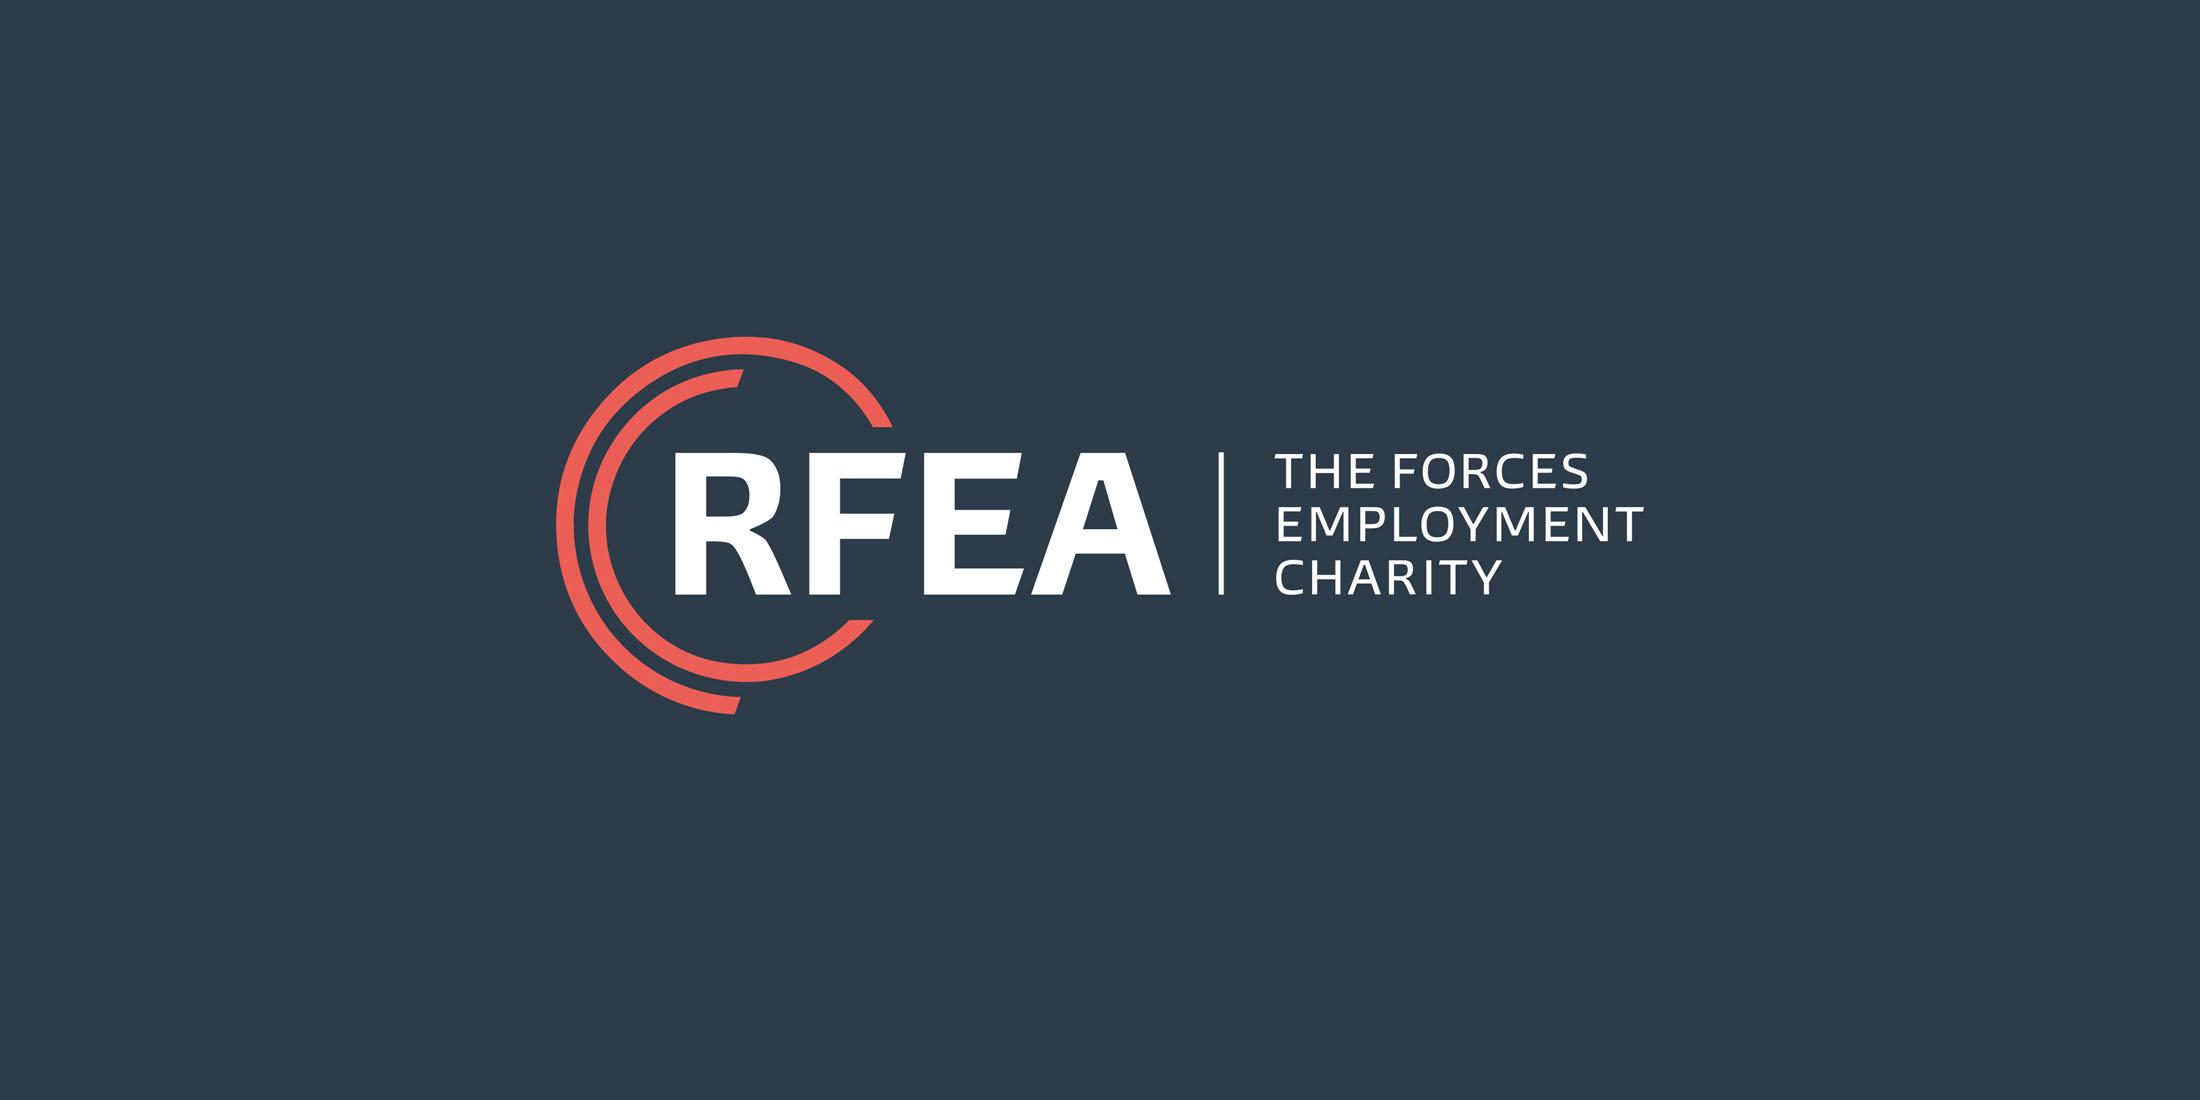 RFEA logos